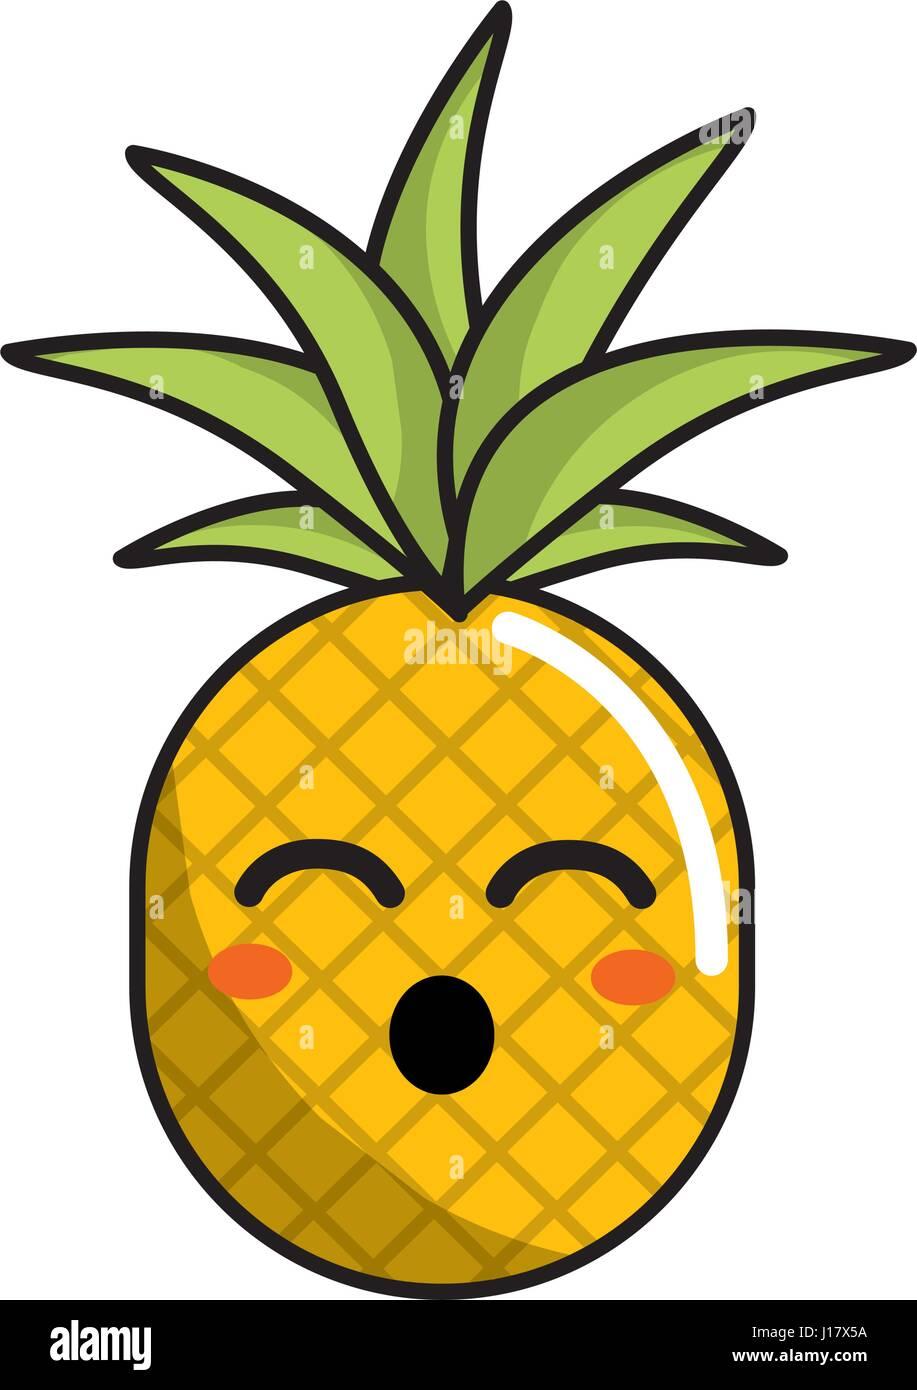 Kawaii Cute Funny Pineapple Vegetable Stock Vector Art